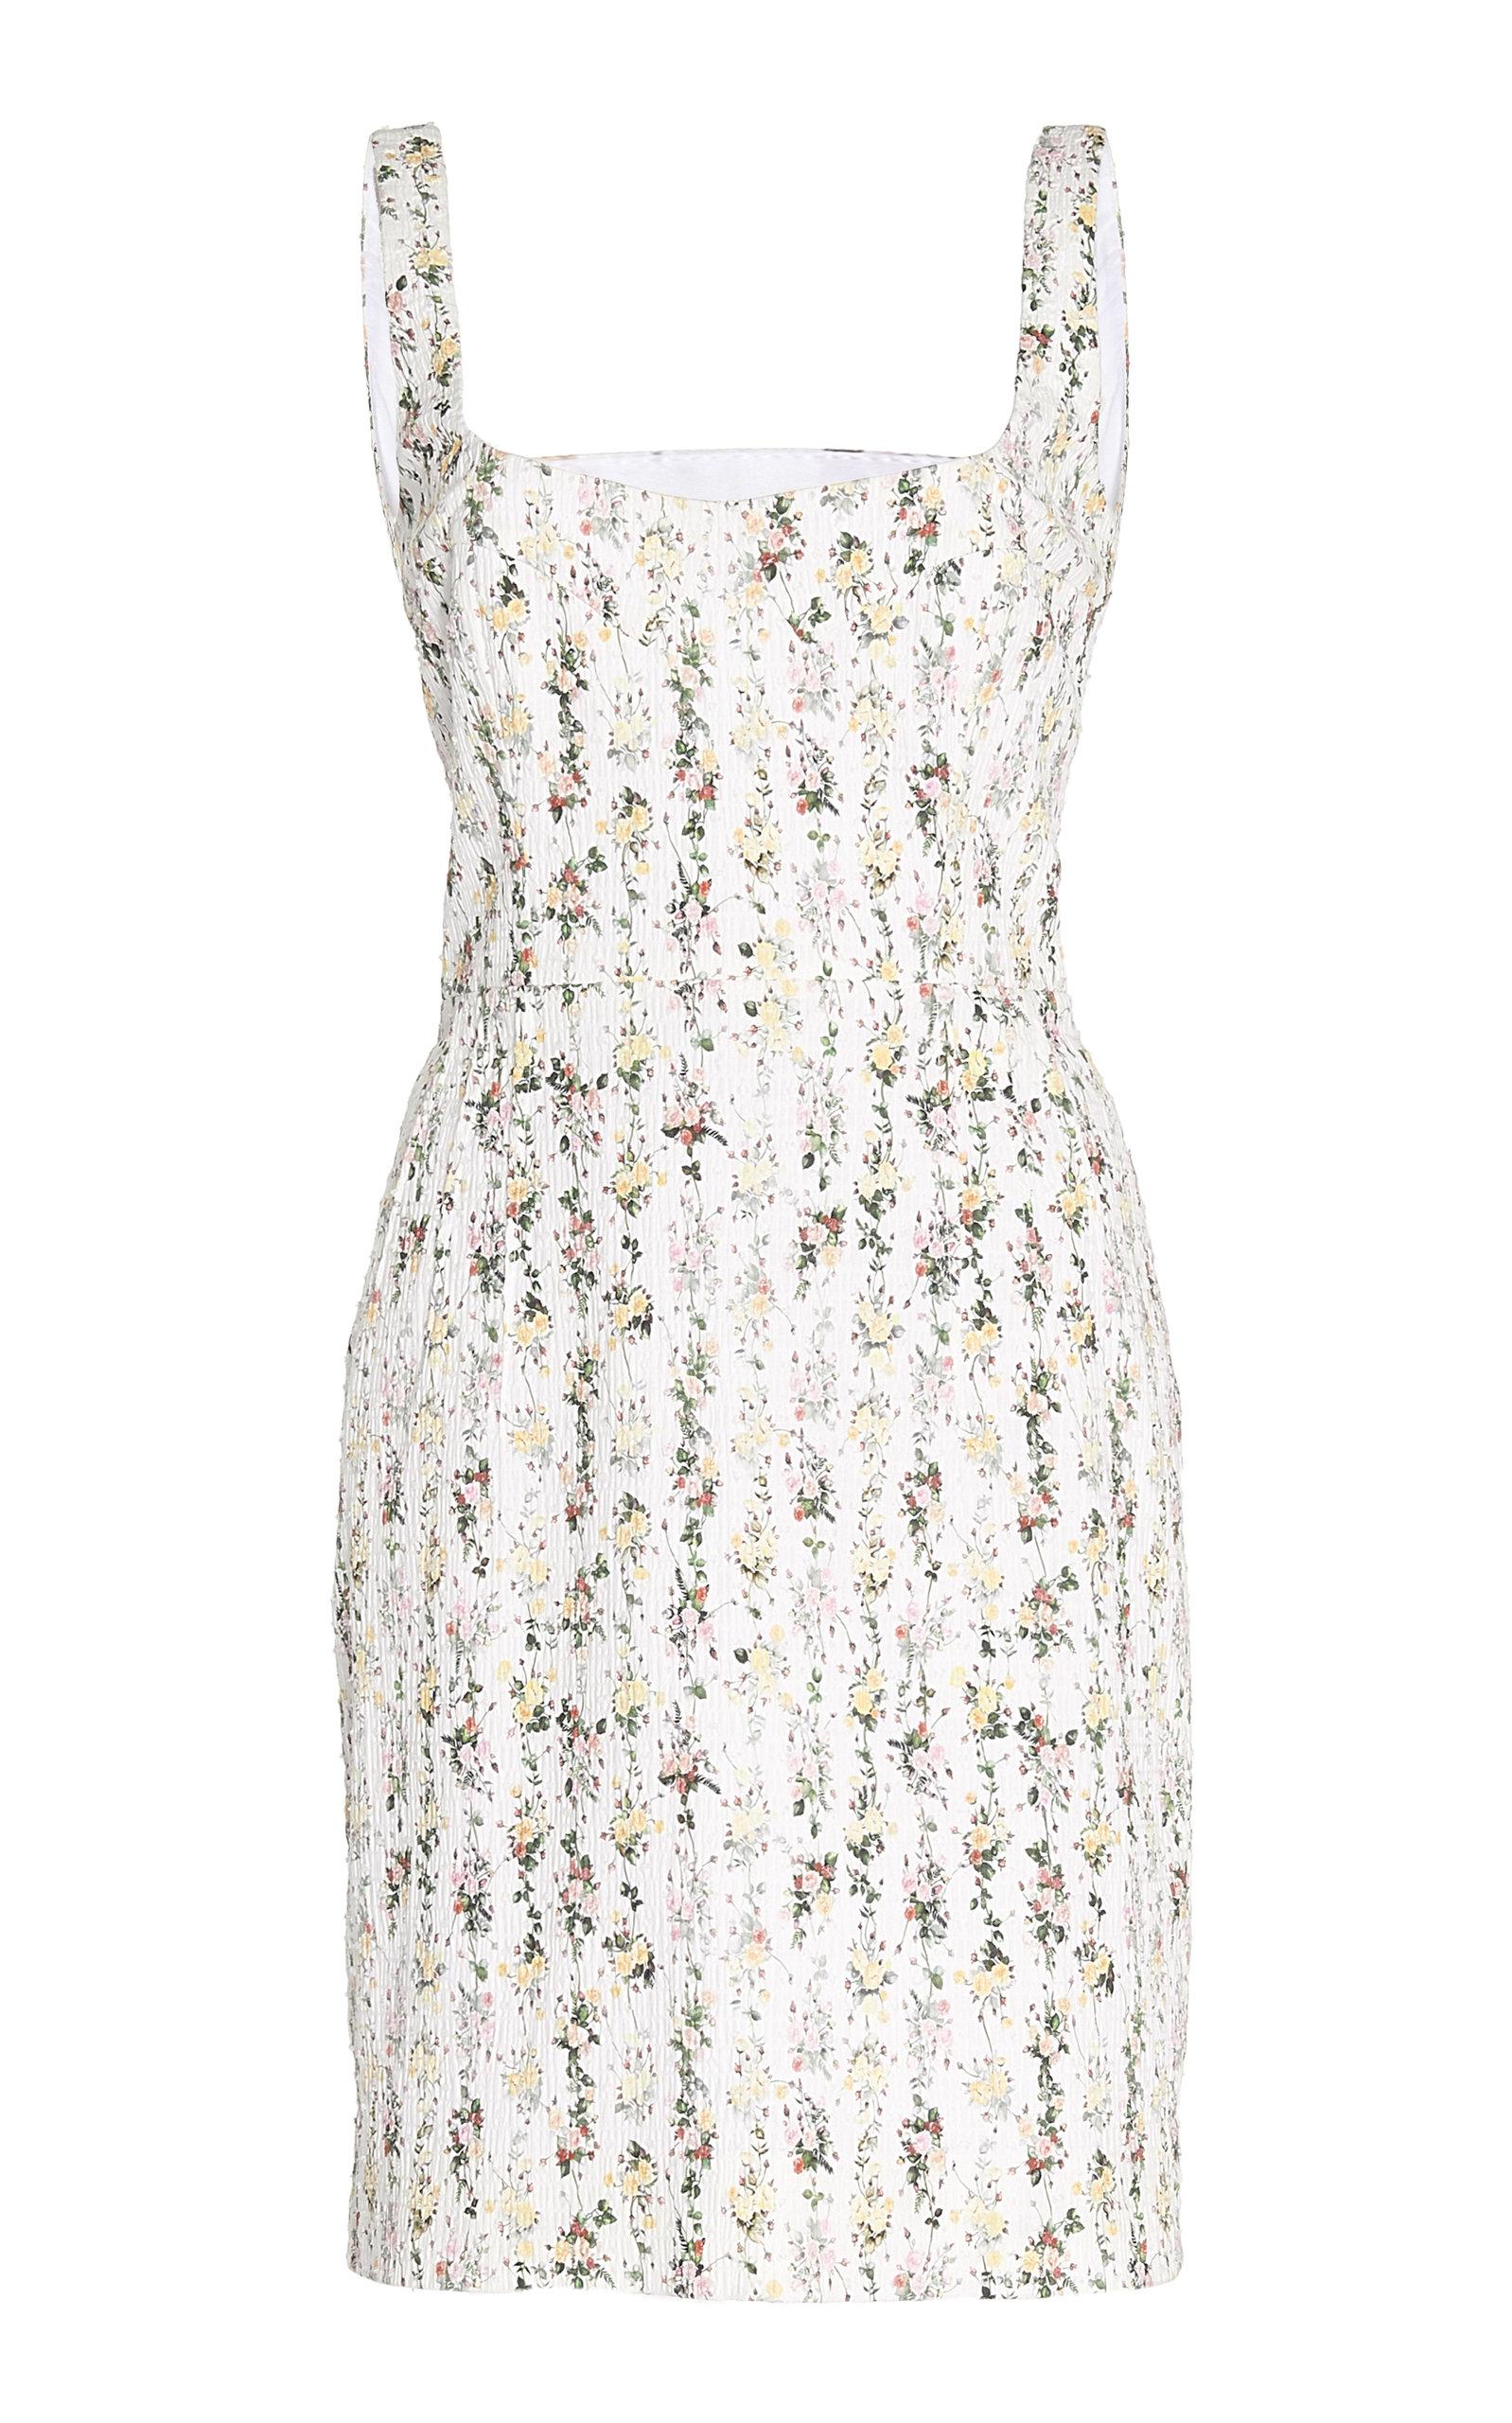 Emilia Wickstead Jezebel Cotton-Blend Dress